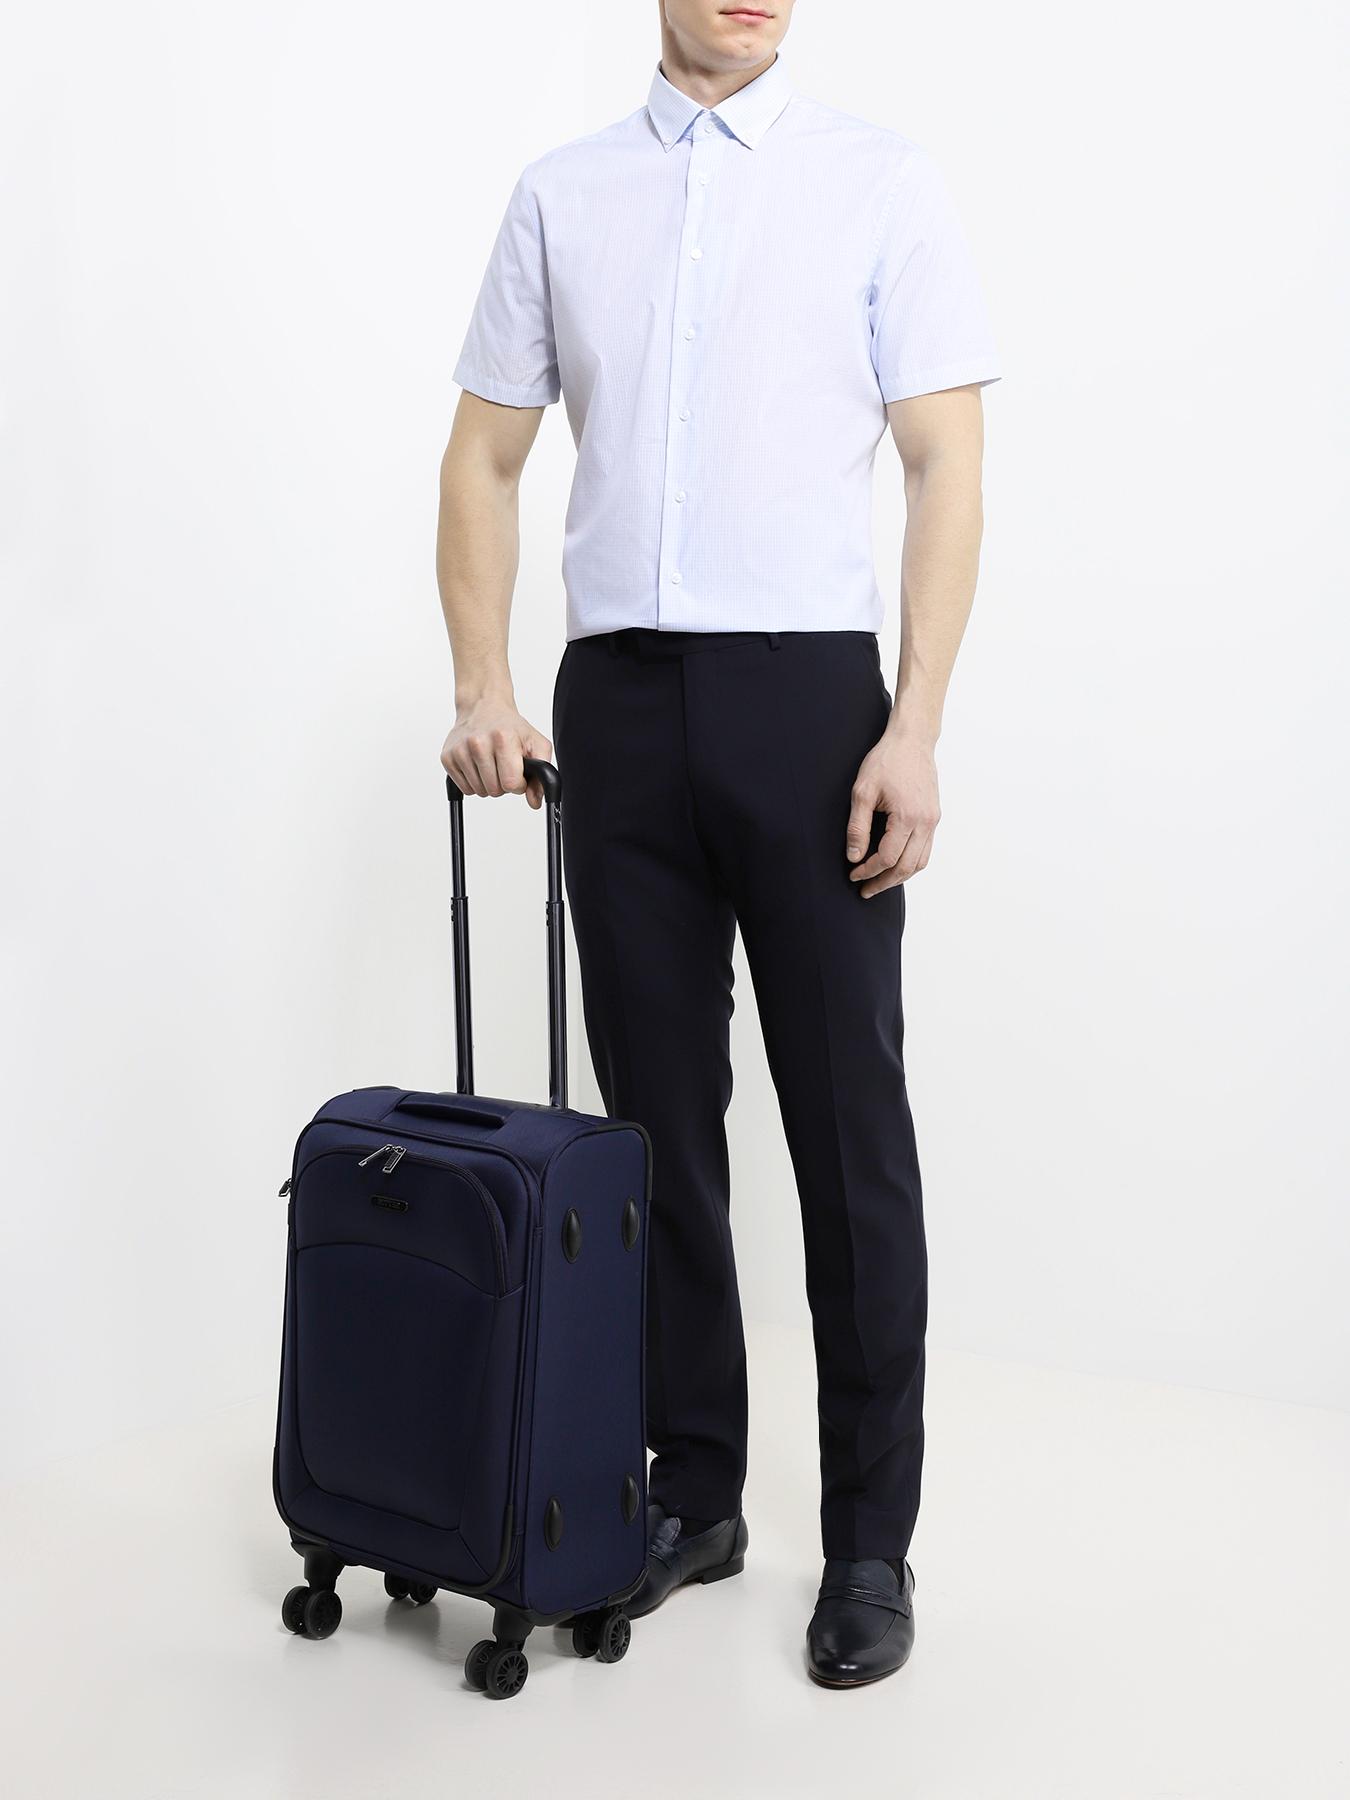 Чемодан Ritter Чемодан RC 20 чемодан ritter чемодан rc 20